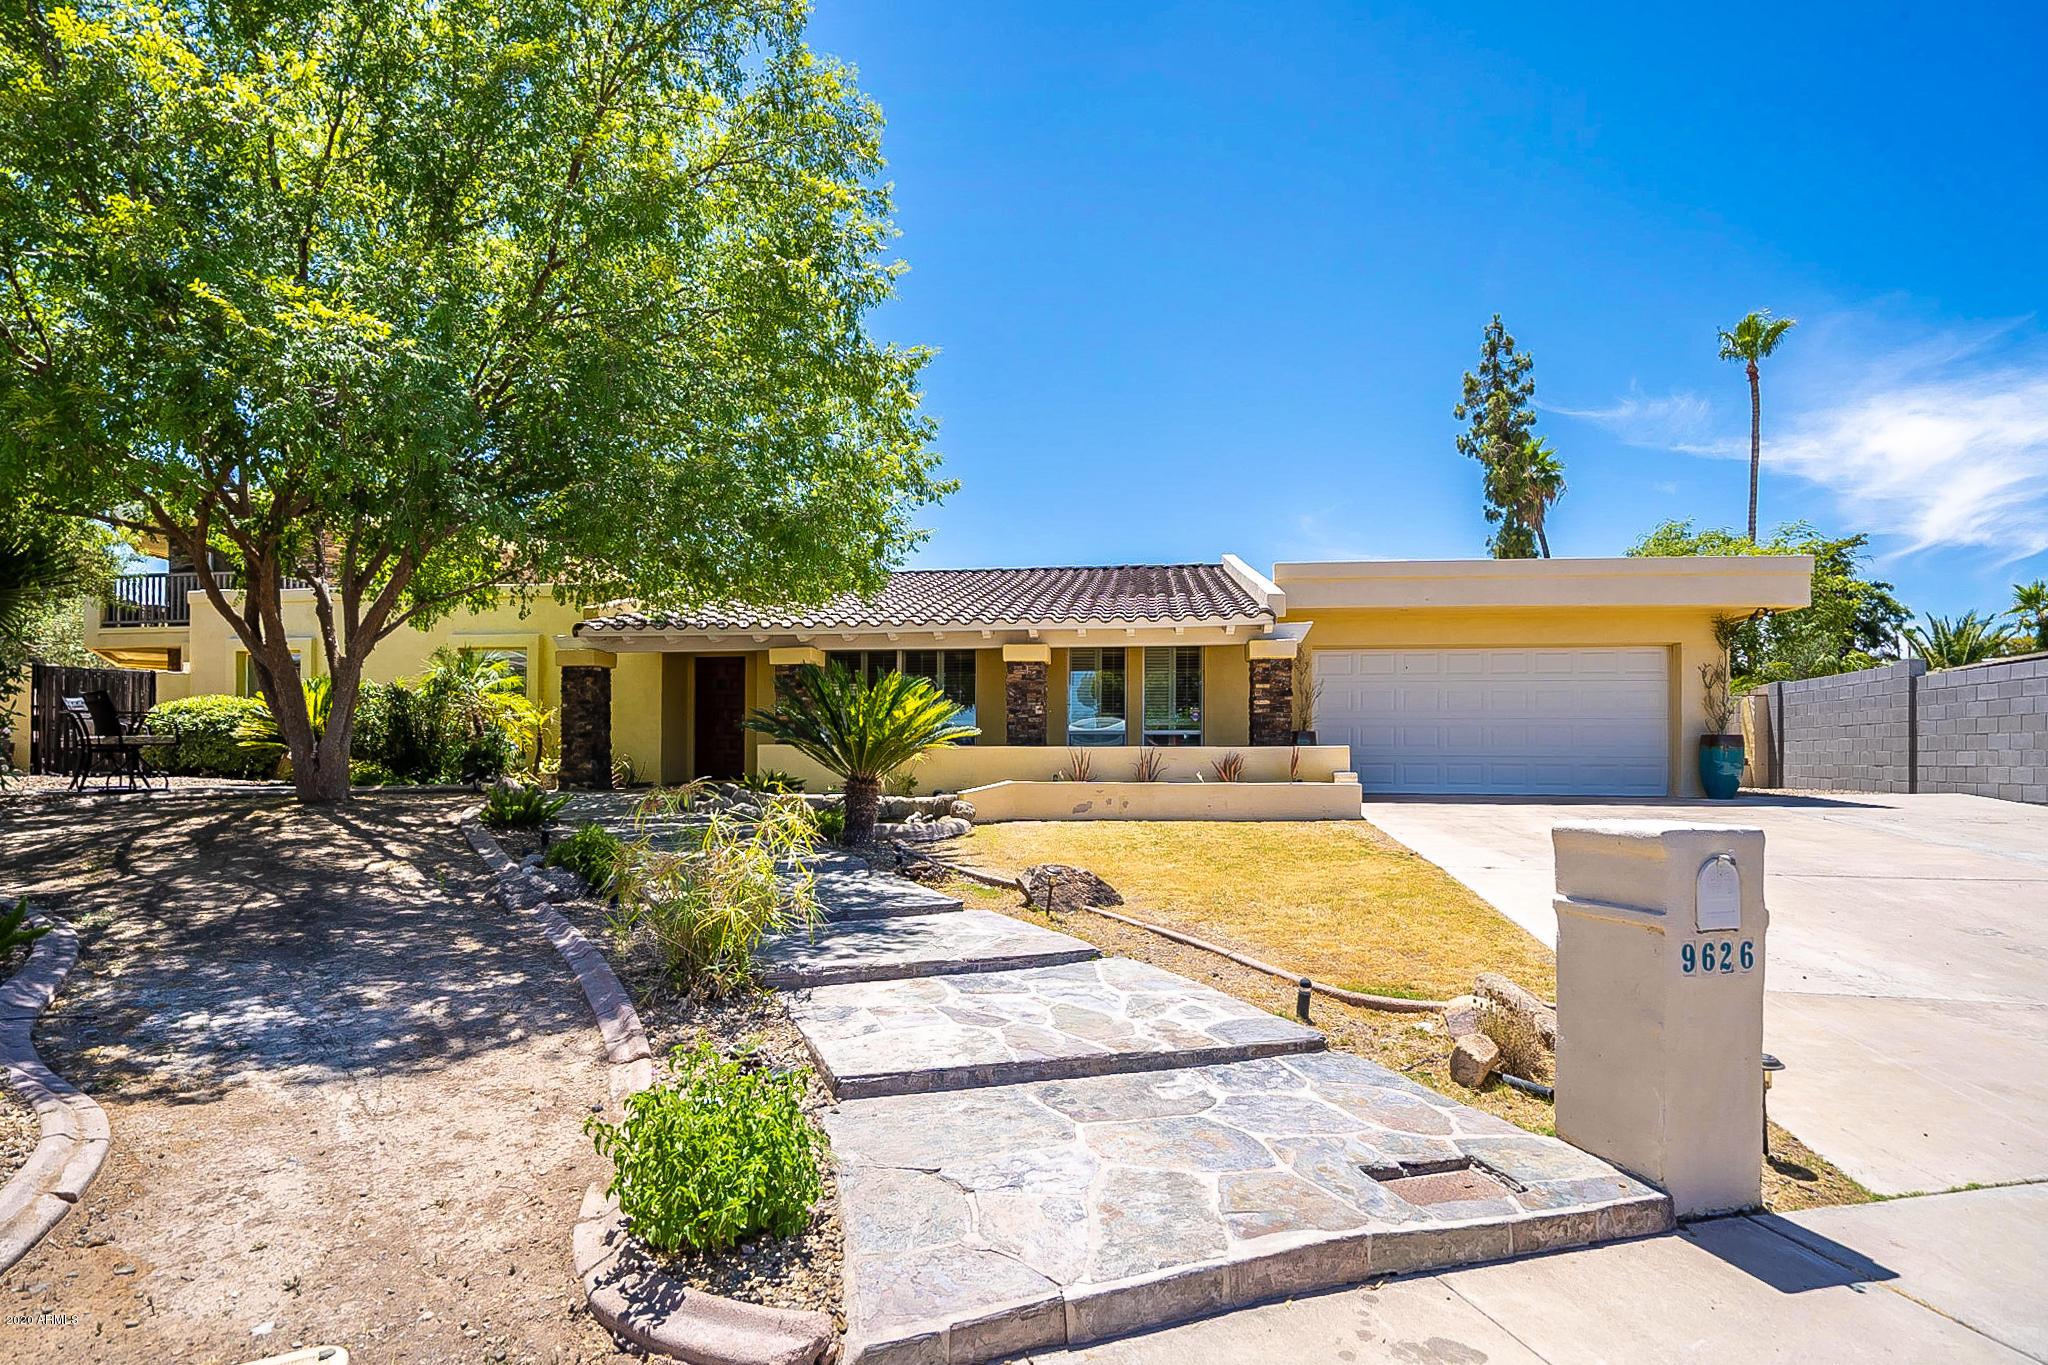 Photo of 9626 N 33rd Street NW, Phoenix, AZ 85028